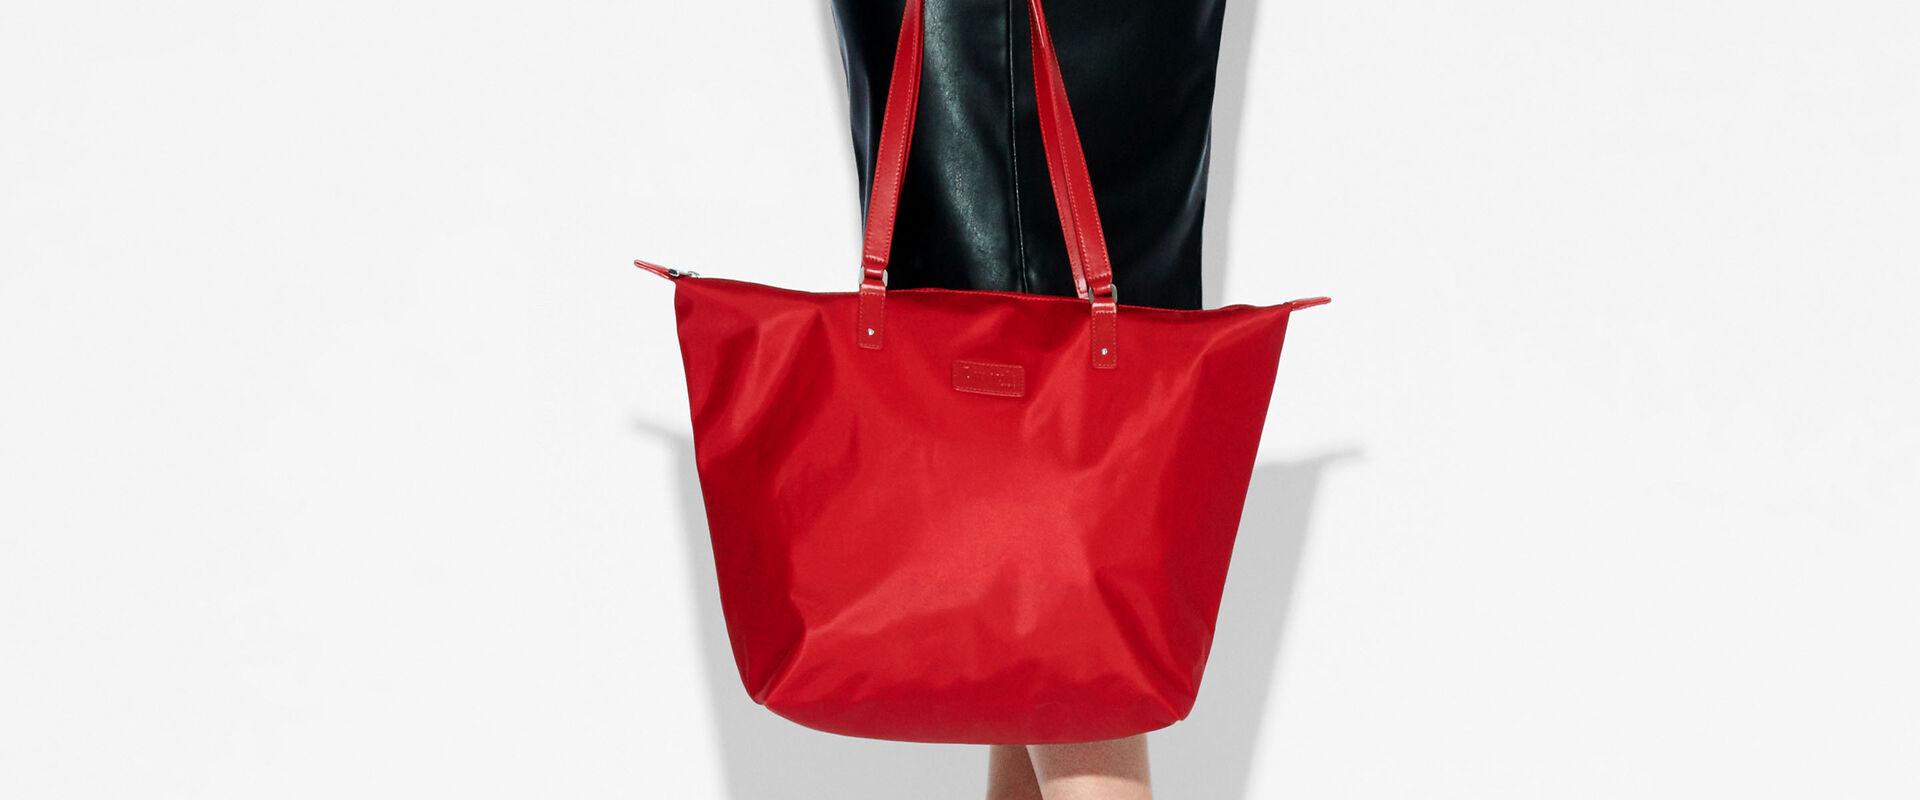 Sacs cabas, Sacs shopping | Lipault